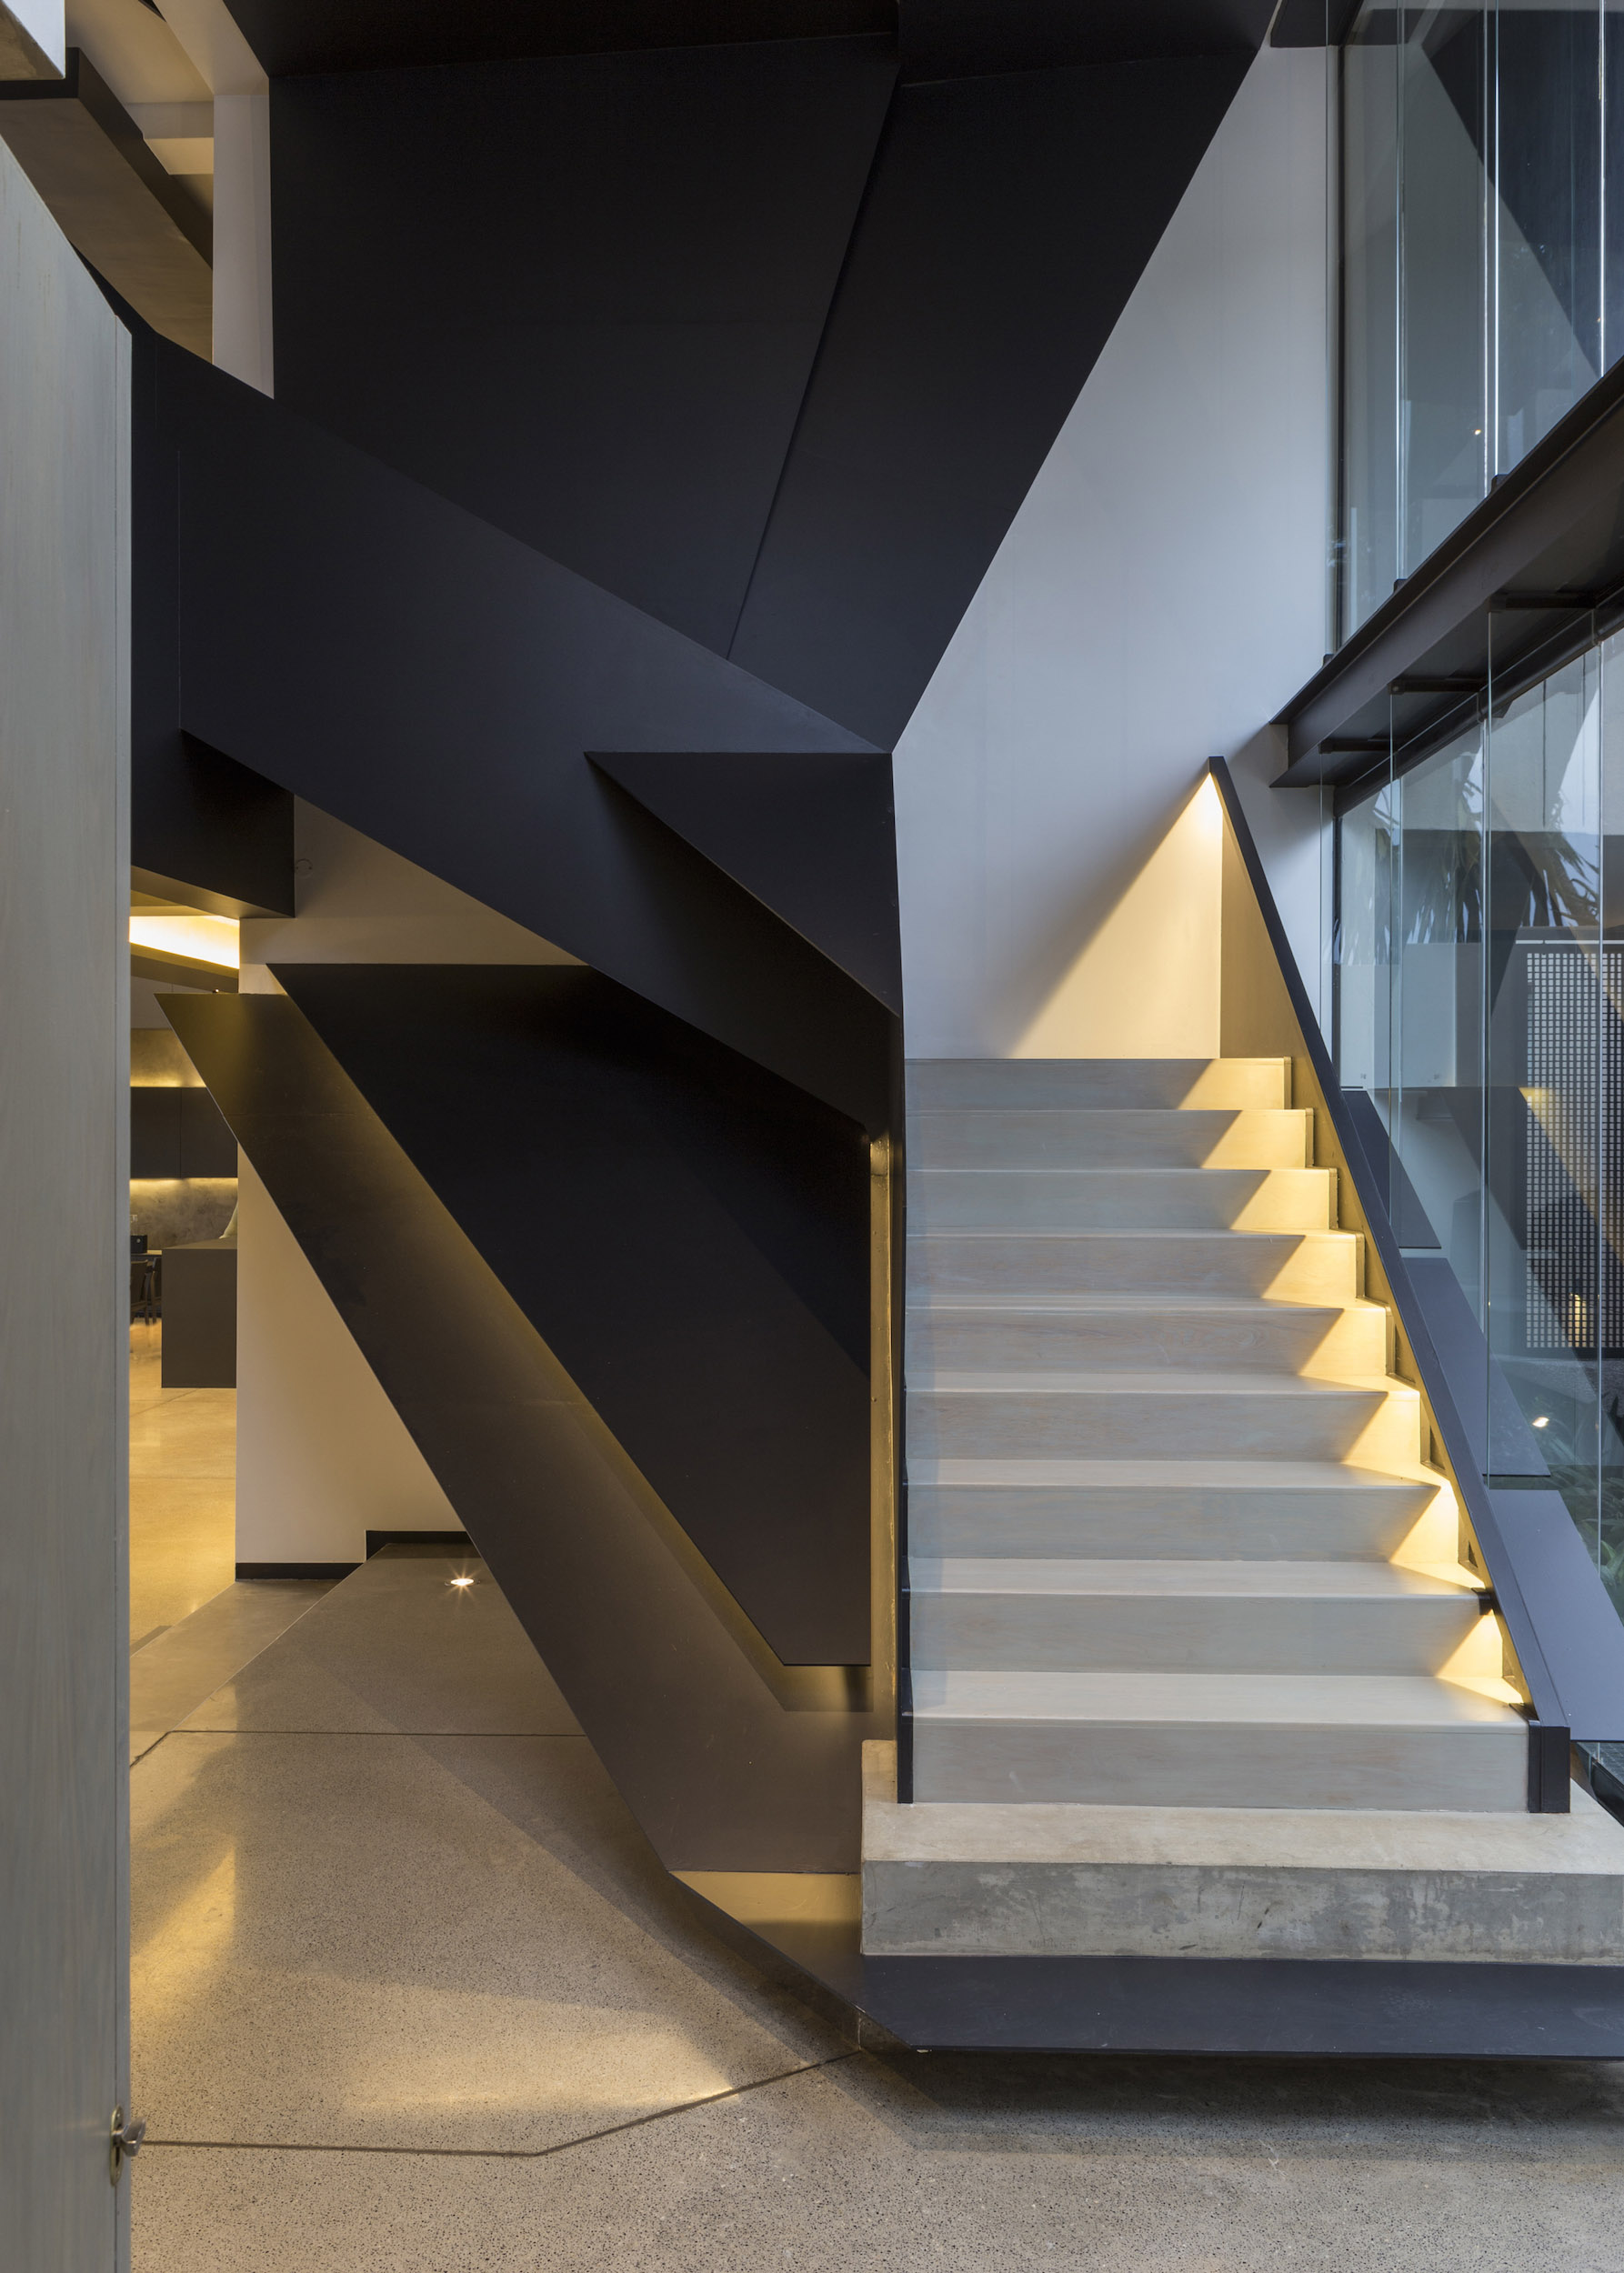 Kloof Road Masterpiece House in Johannesburg by Nico van der Meulen Architects-06